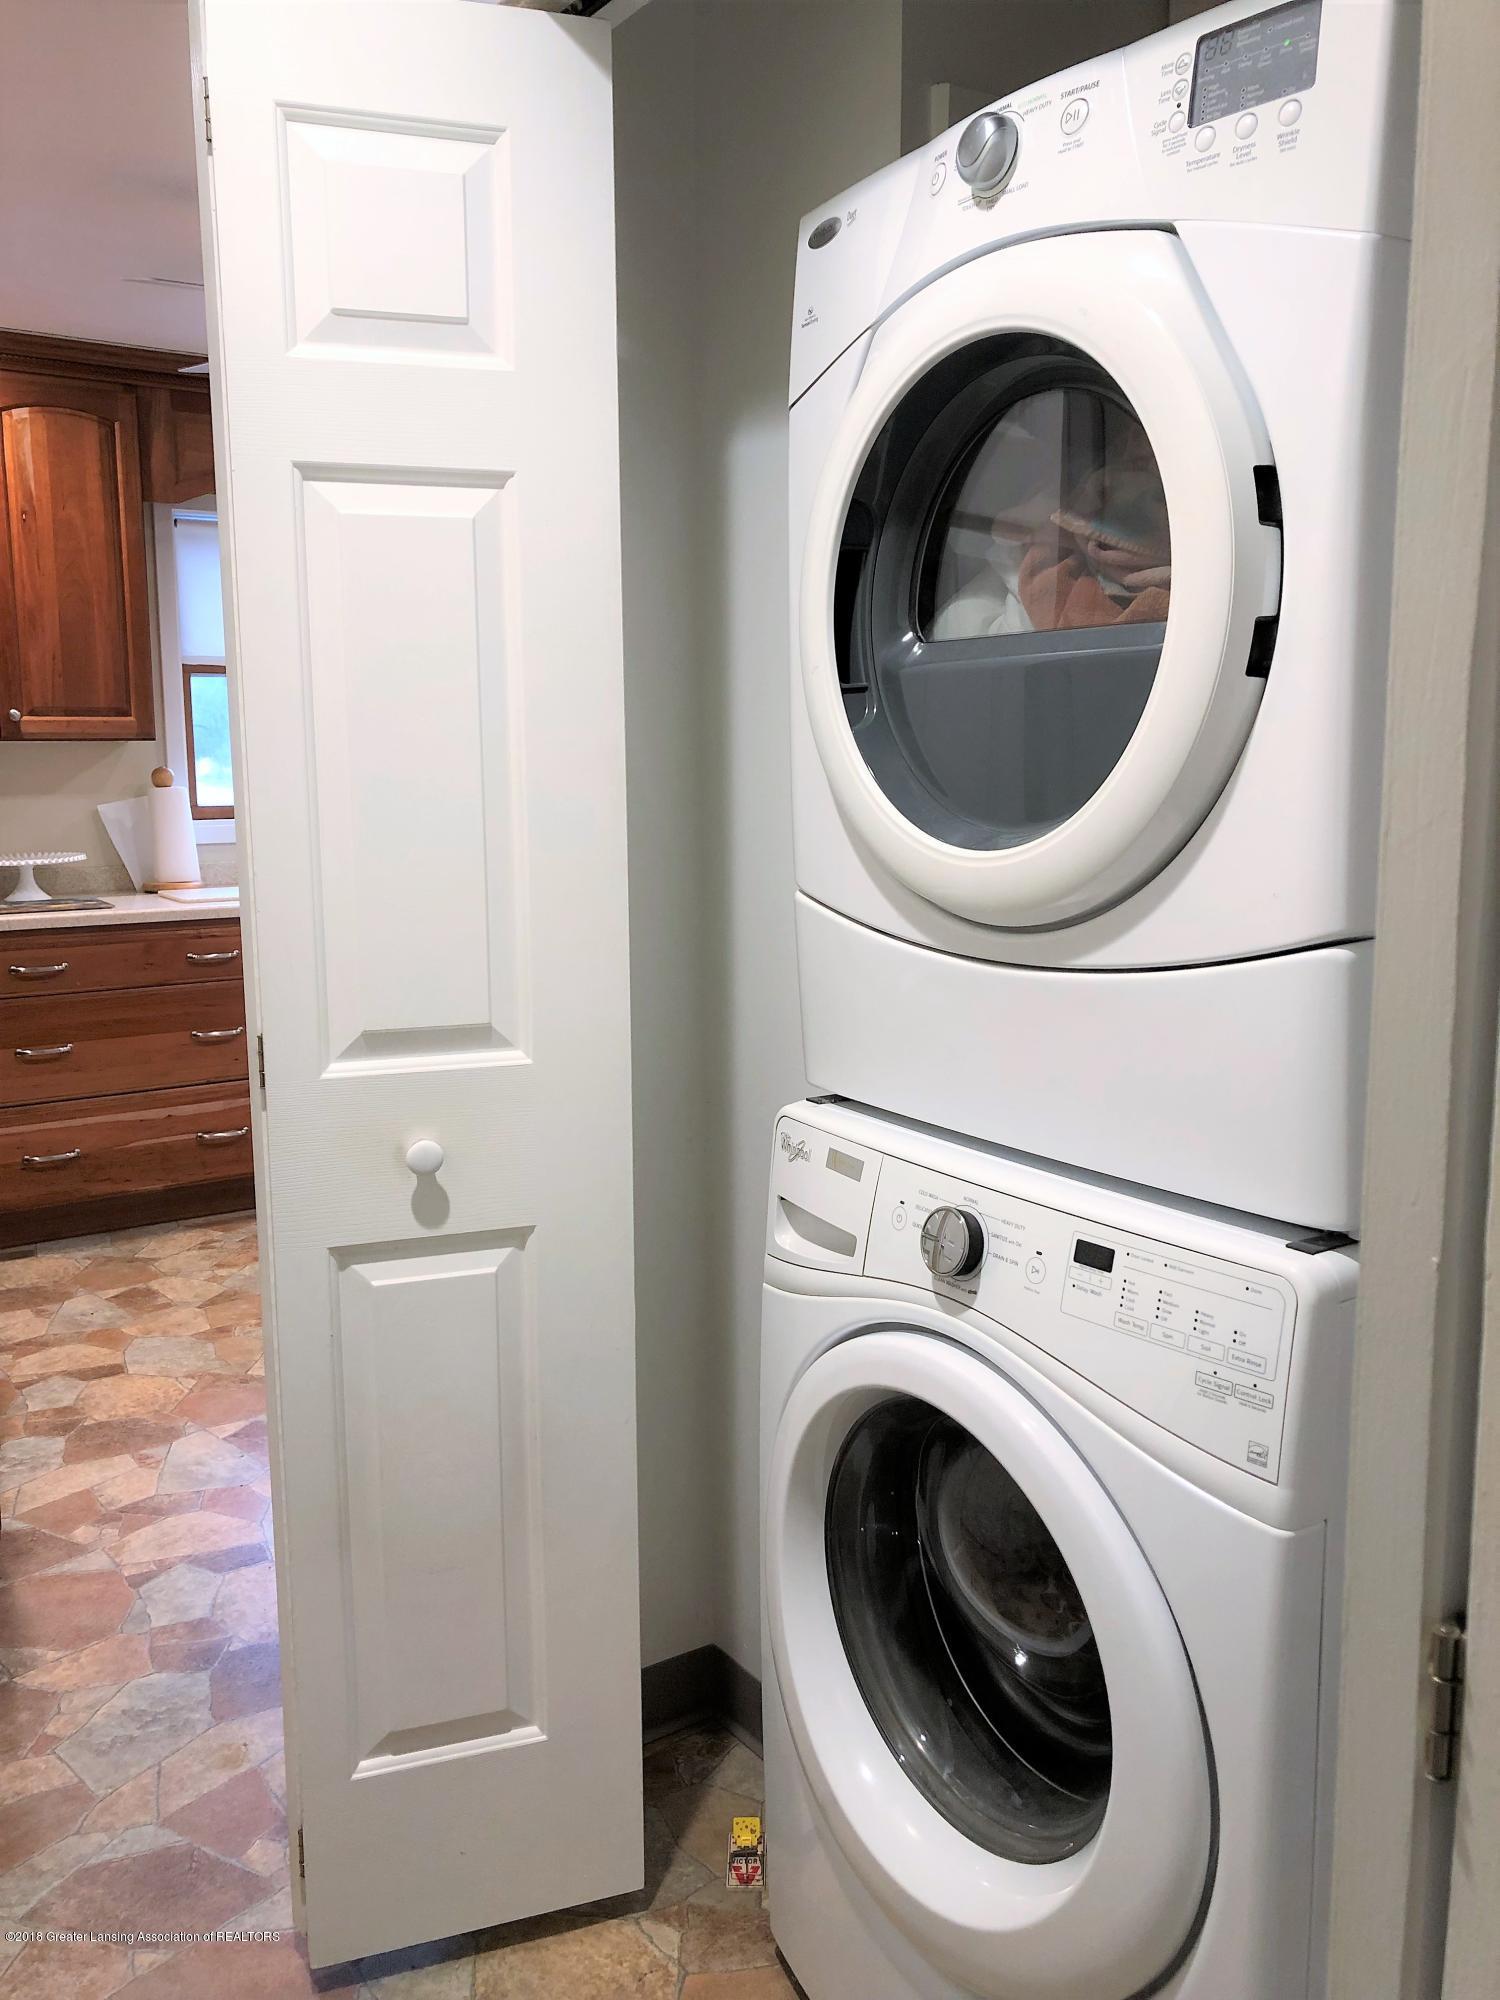 341 S Eifert Rd - Laundry - 12